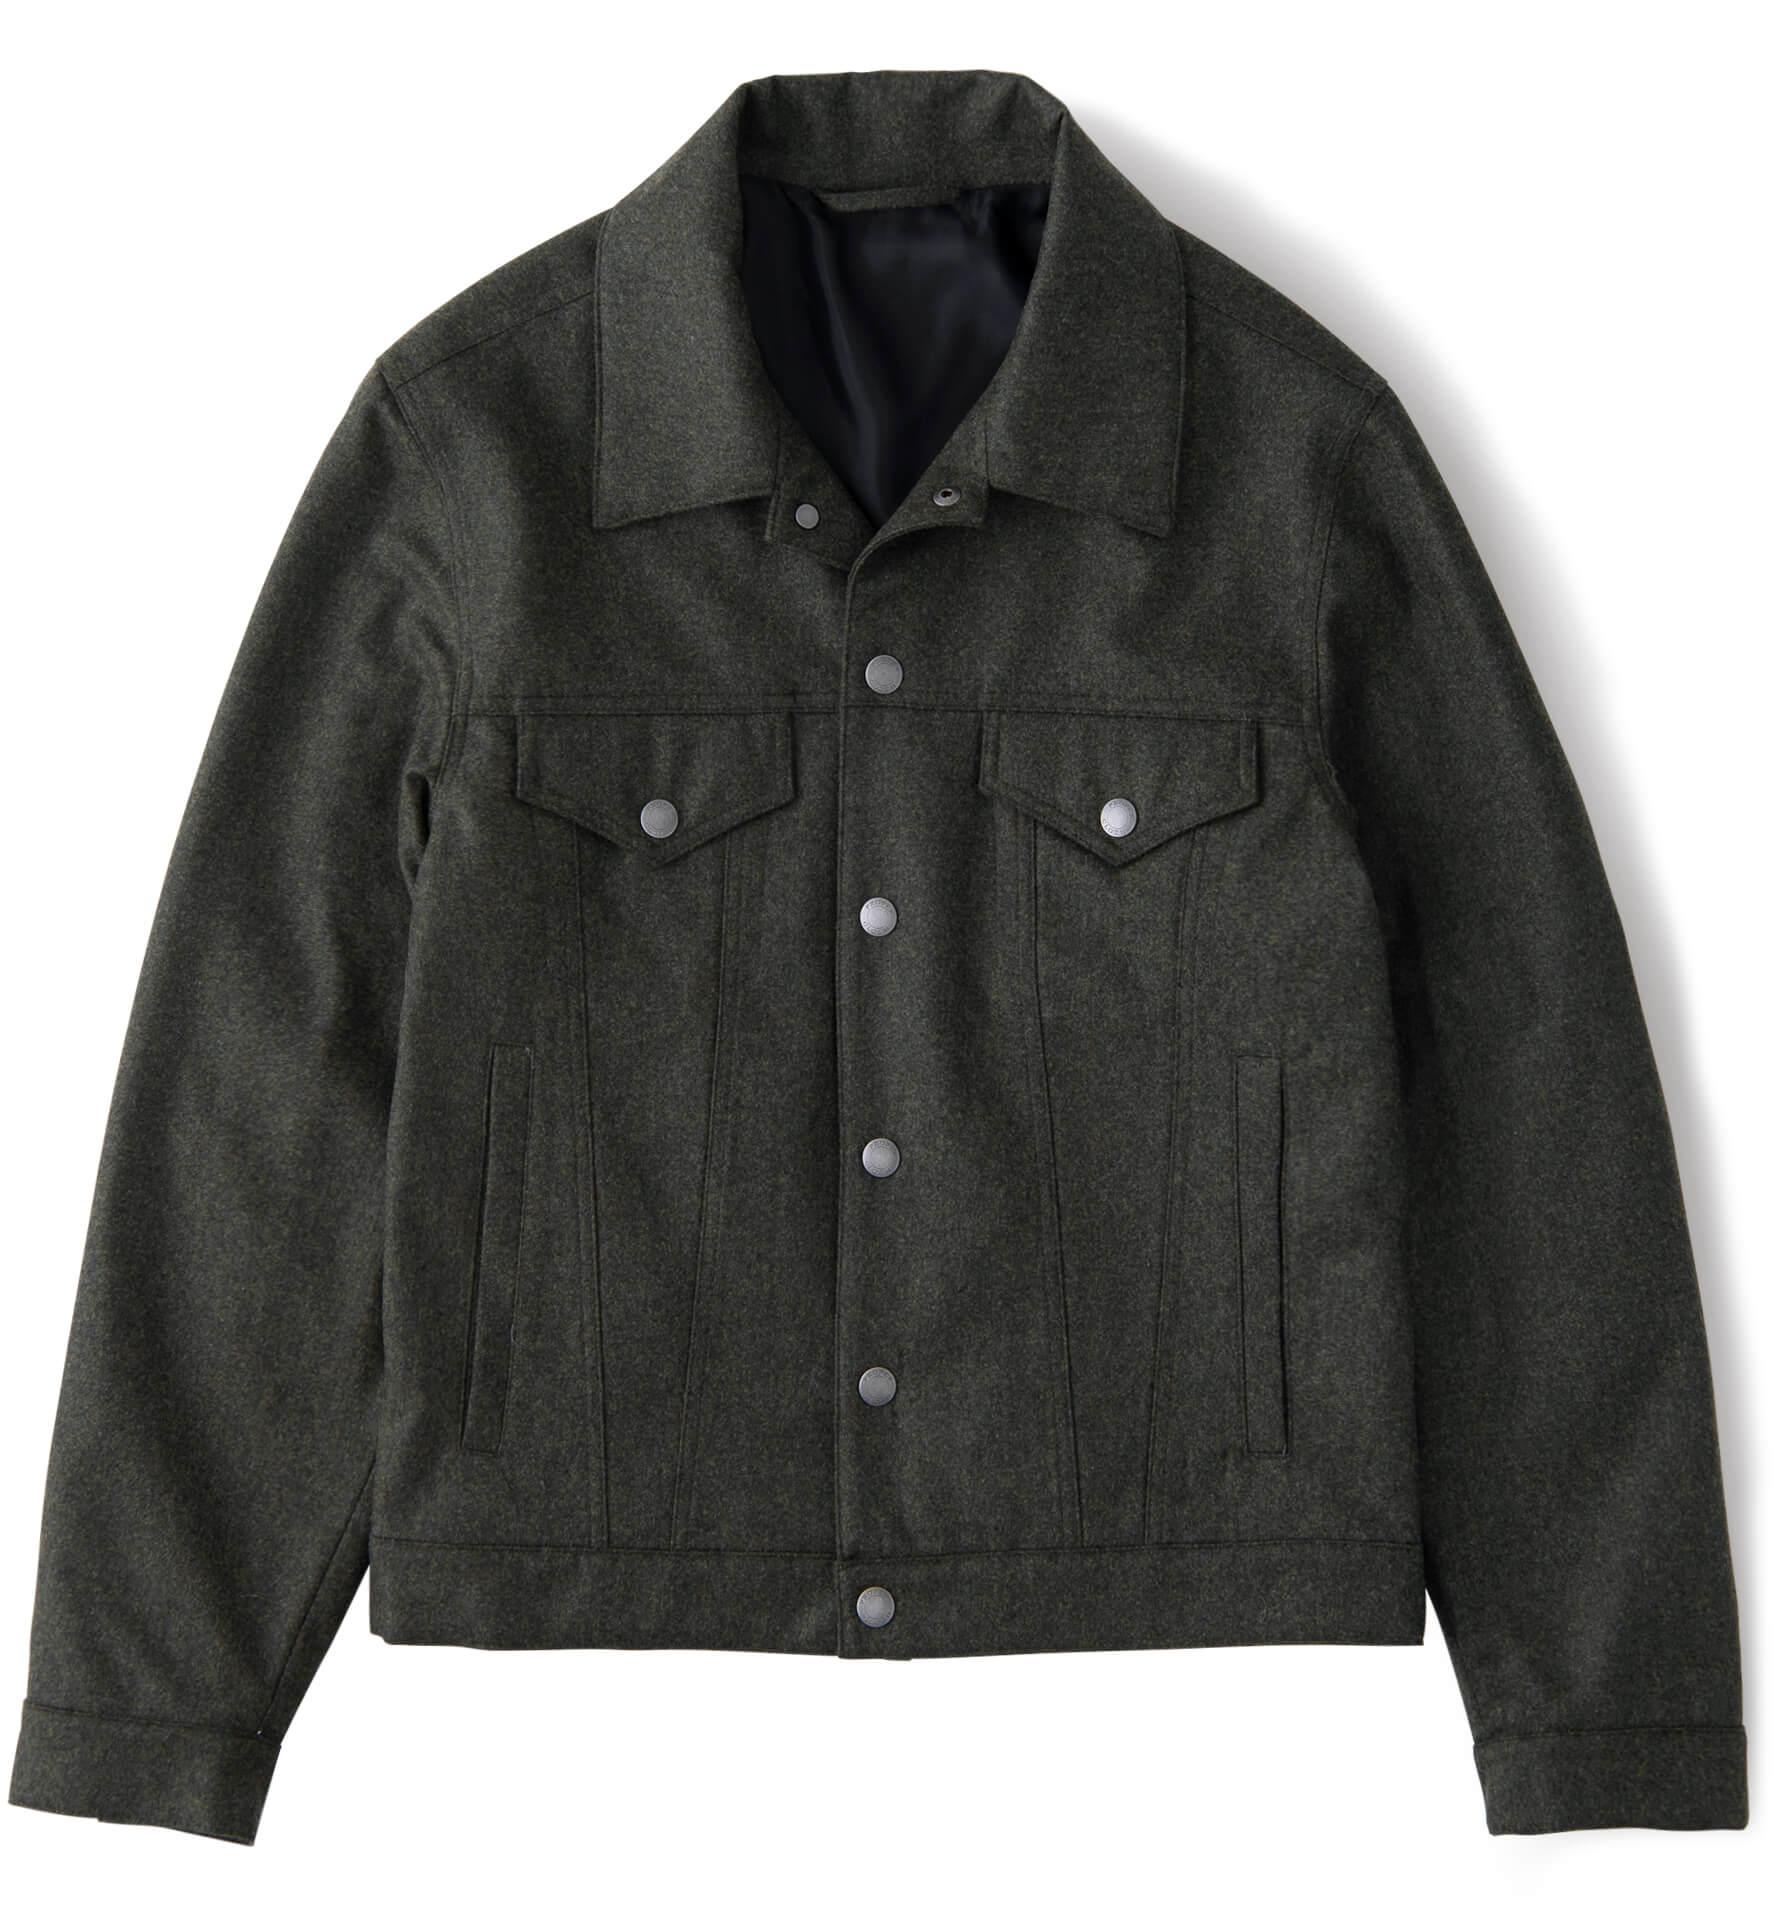 Zoom Image of Lafayette Pine Wool Trucker Jacket